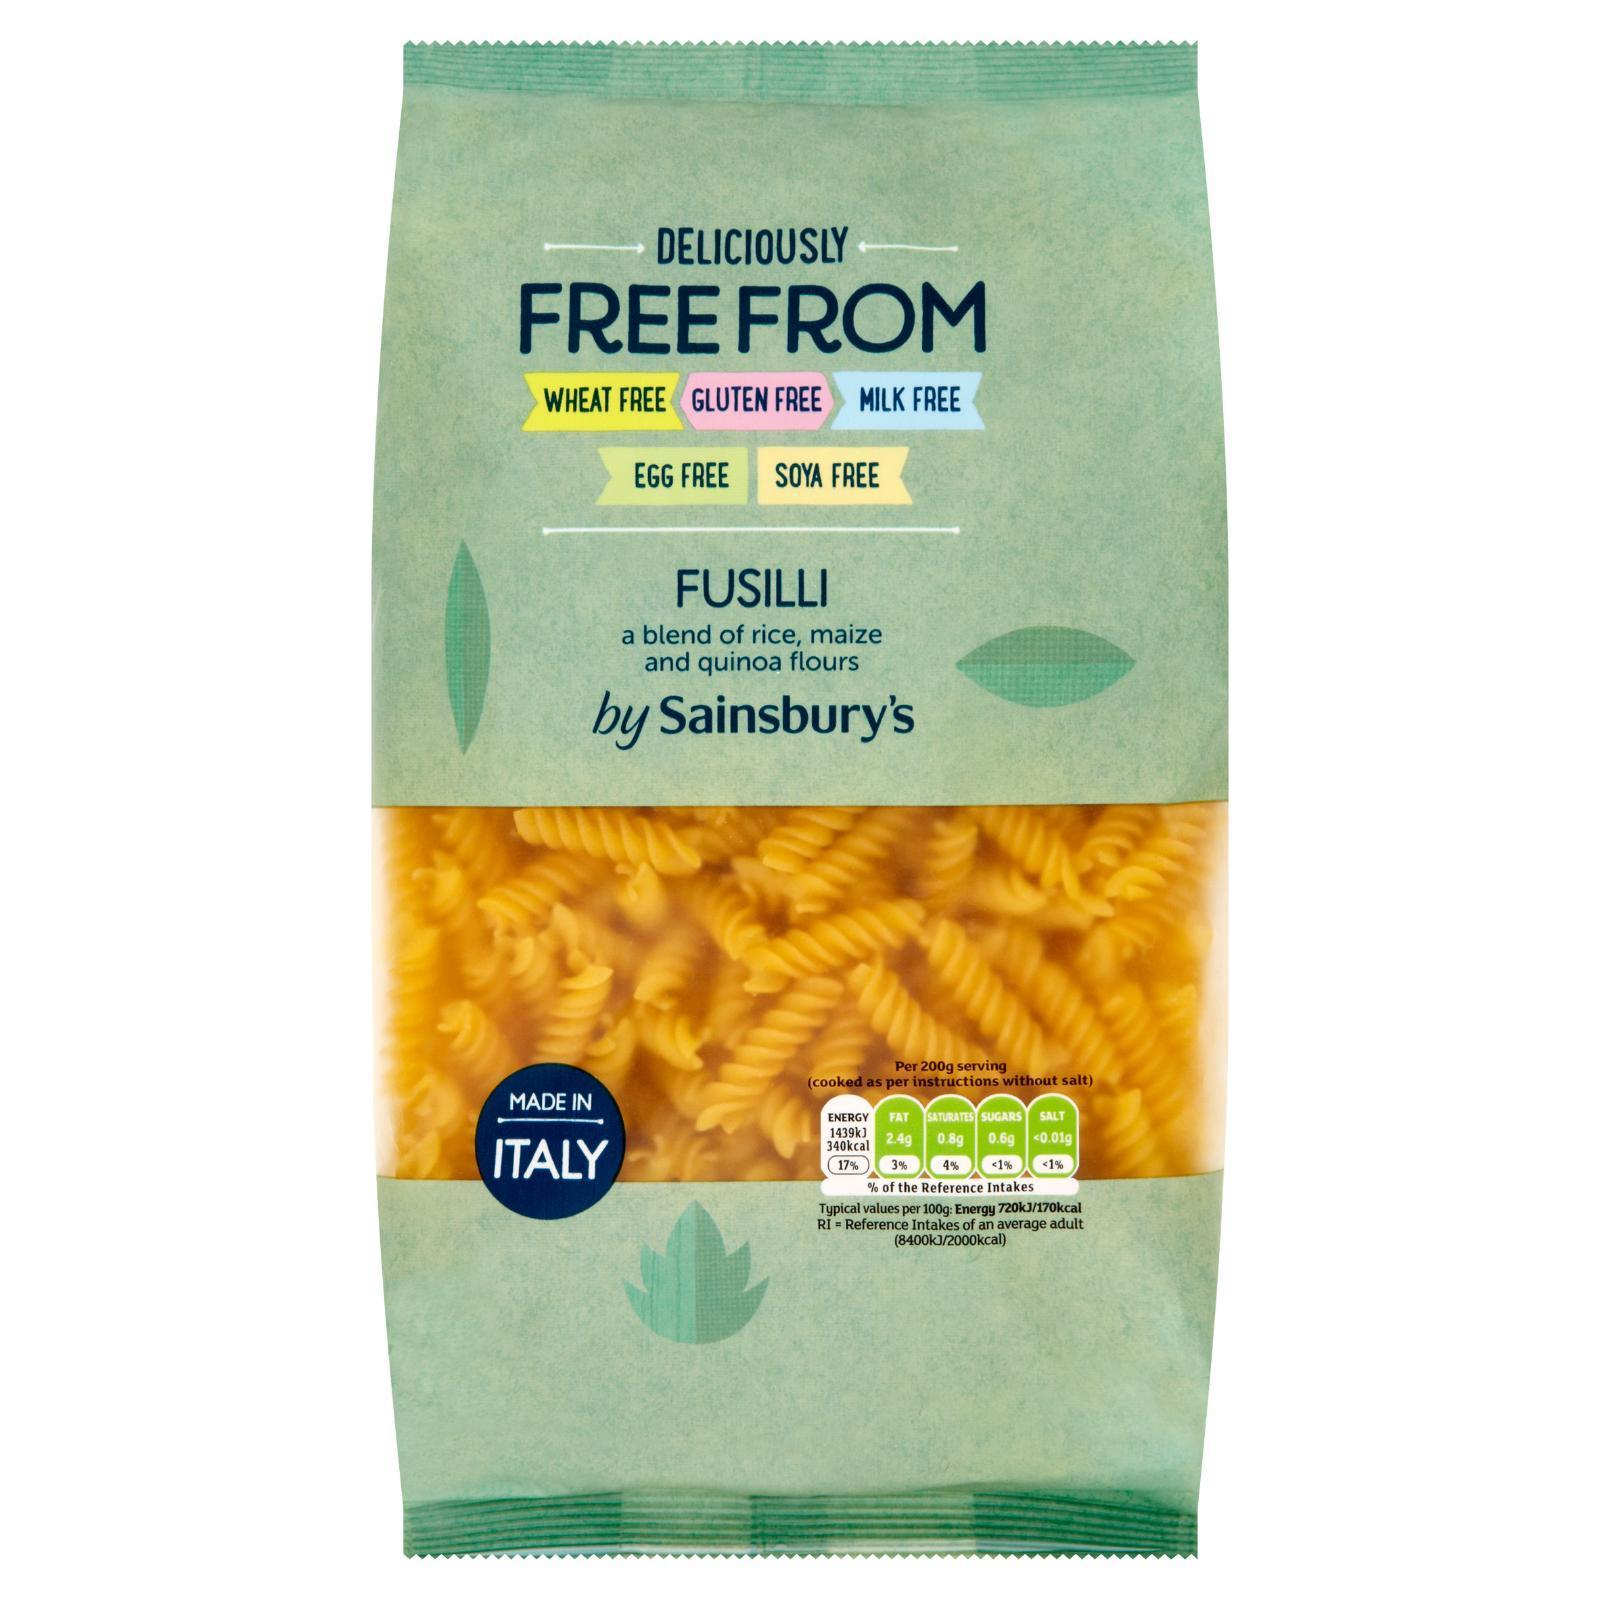 Sainsbury's Free From Fusilli